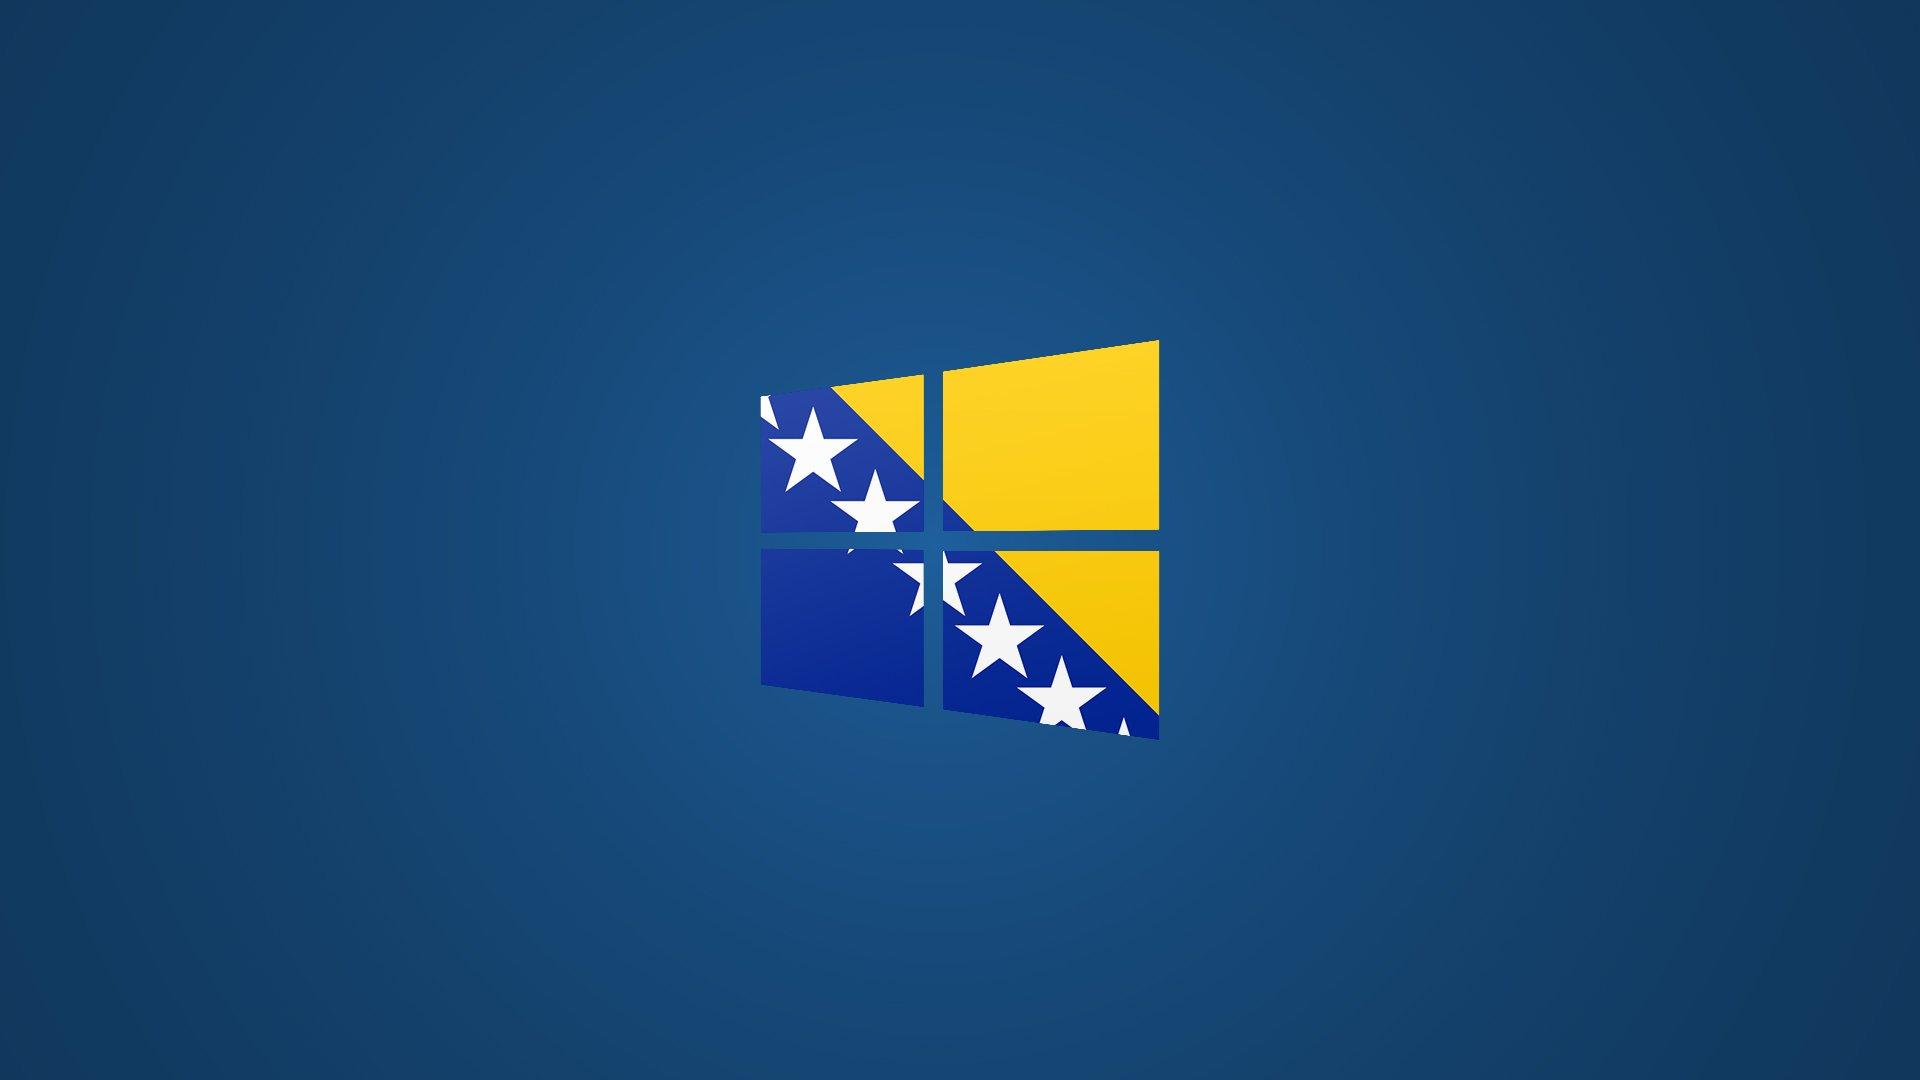 Windows 8 Bosnian Flag Logo Wallpaper Blue by Edinev 1920x1080